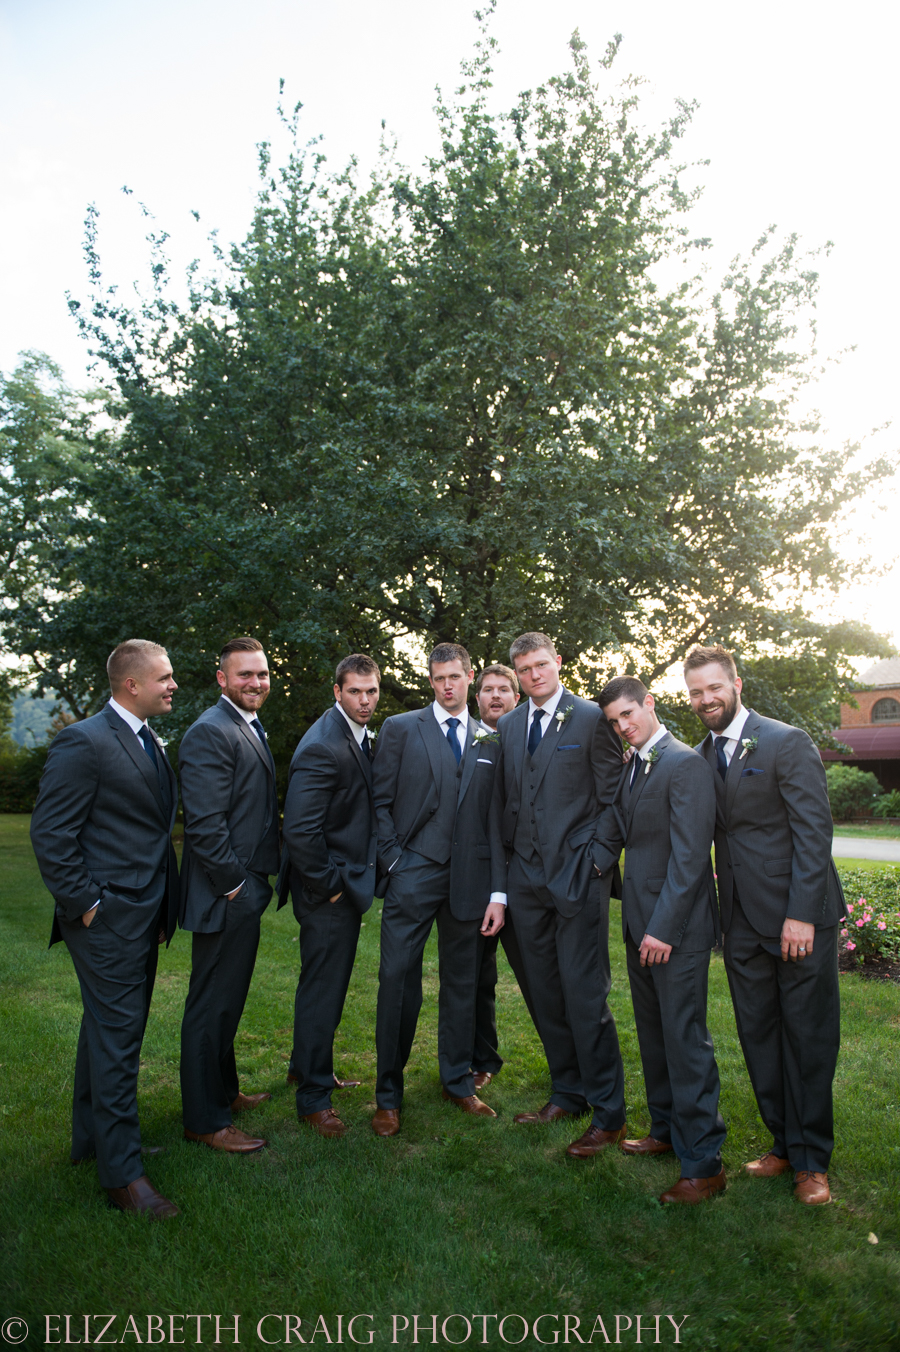 pittsburgh-greek-weddings-fairmont-weddings-receptions-elizabeth-craig-photohgraphy-014